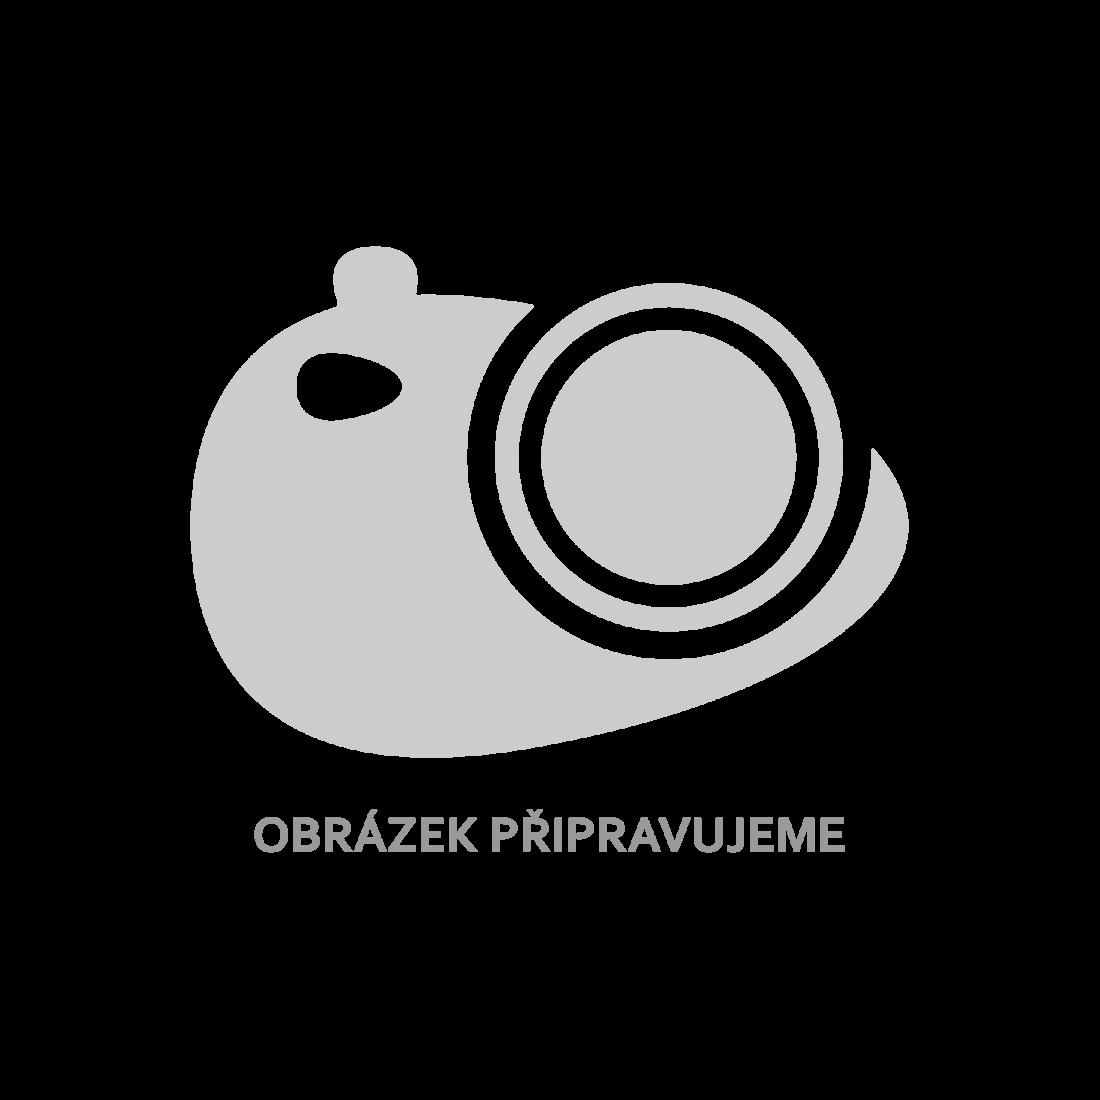 Roleta Zebra / noc a den / Twinroll 120 x 230 cm, bílá